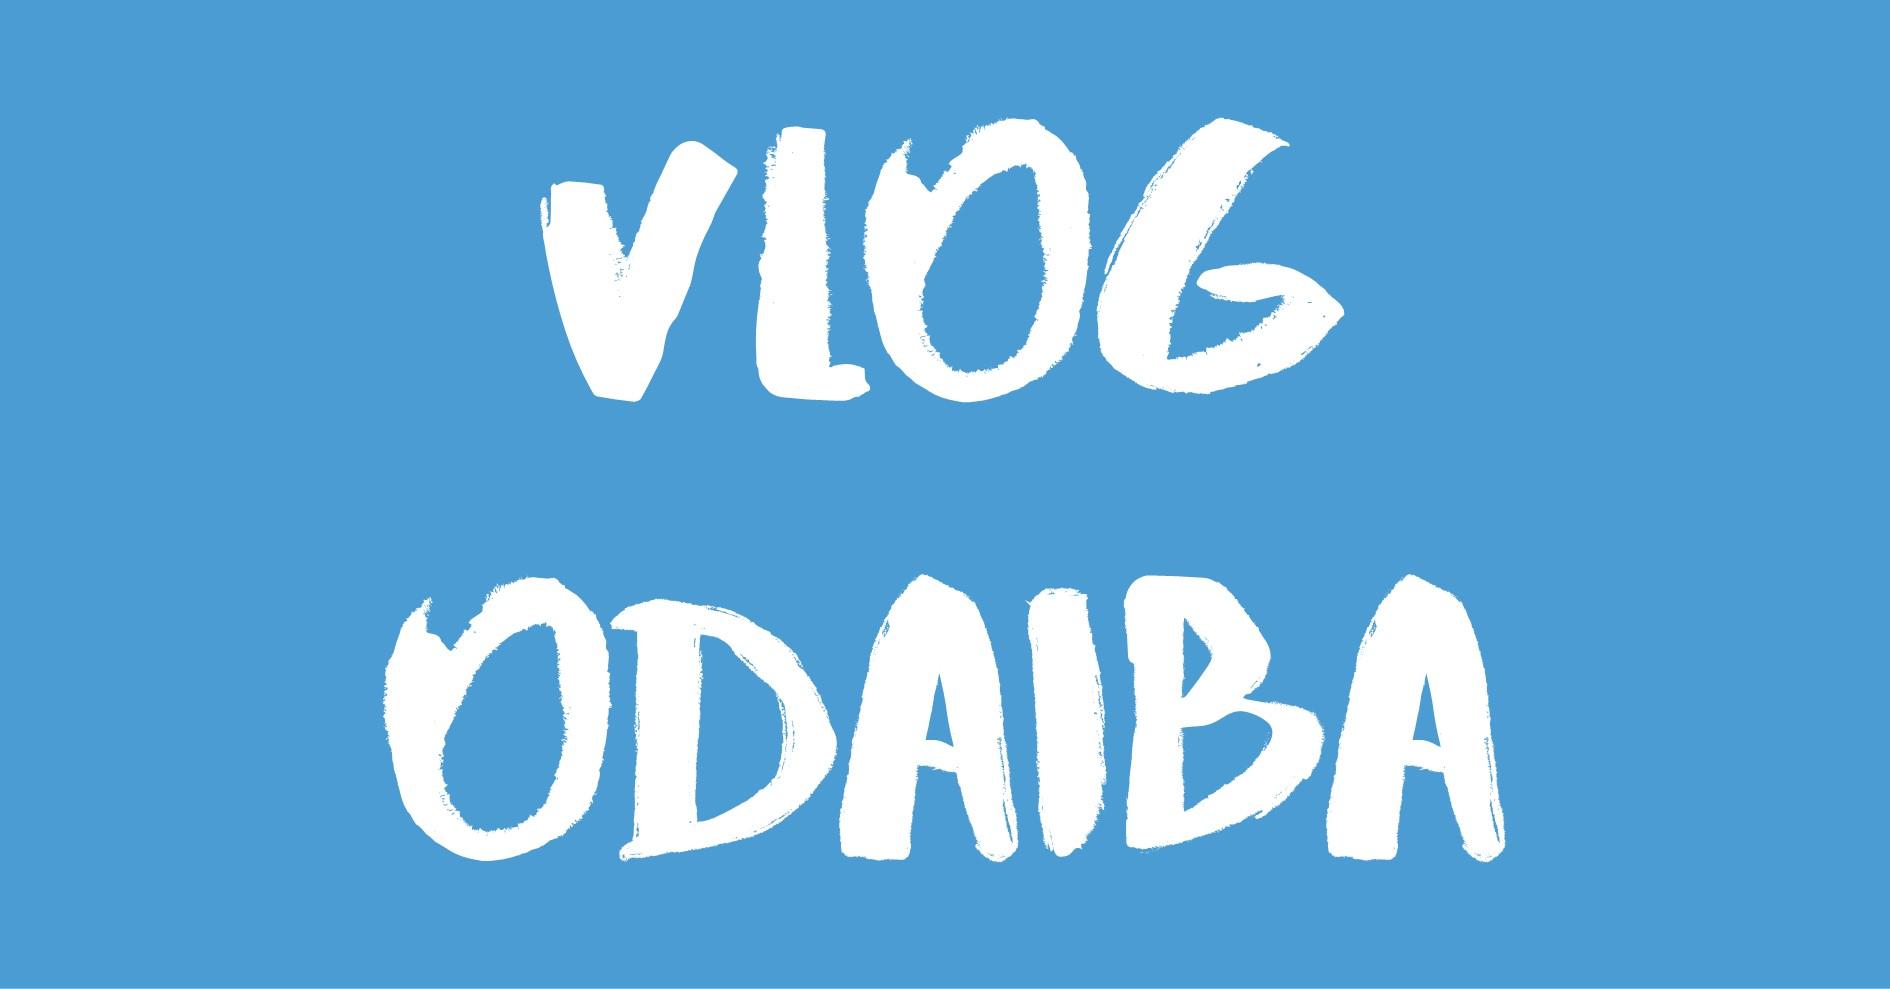 [Vlog] お台場 / Odaiba